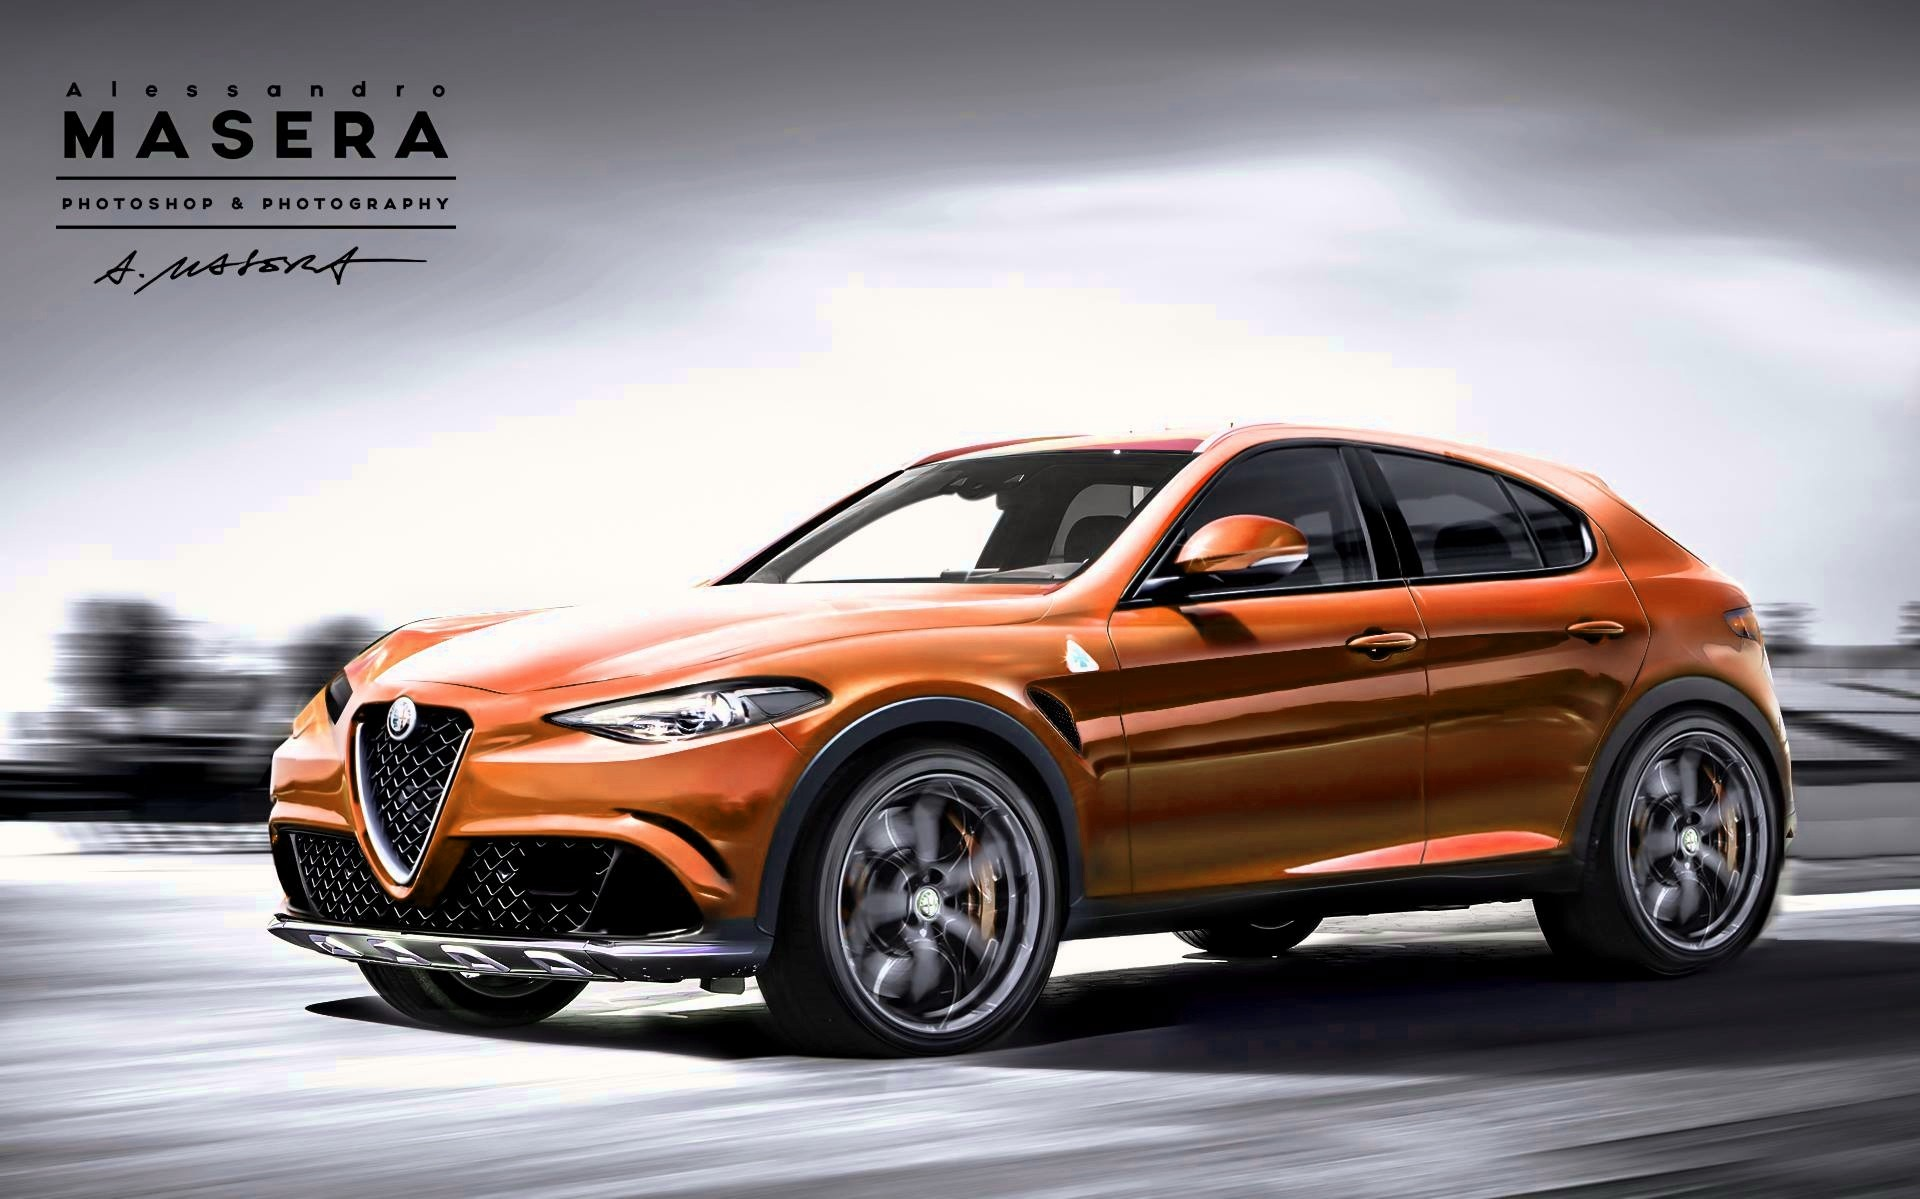 Alfa Romeo Stelvio Tipo 949 D Suv Name Confirmed Production Starts In Q4 2016 Autoevolution